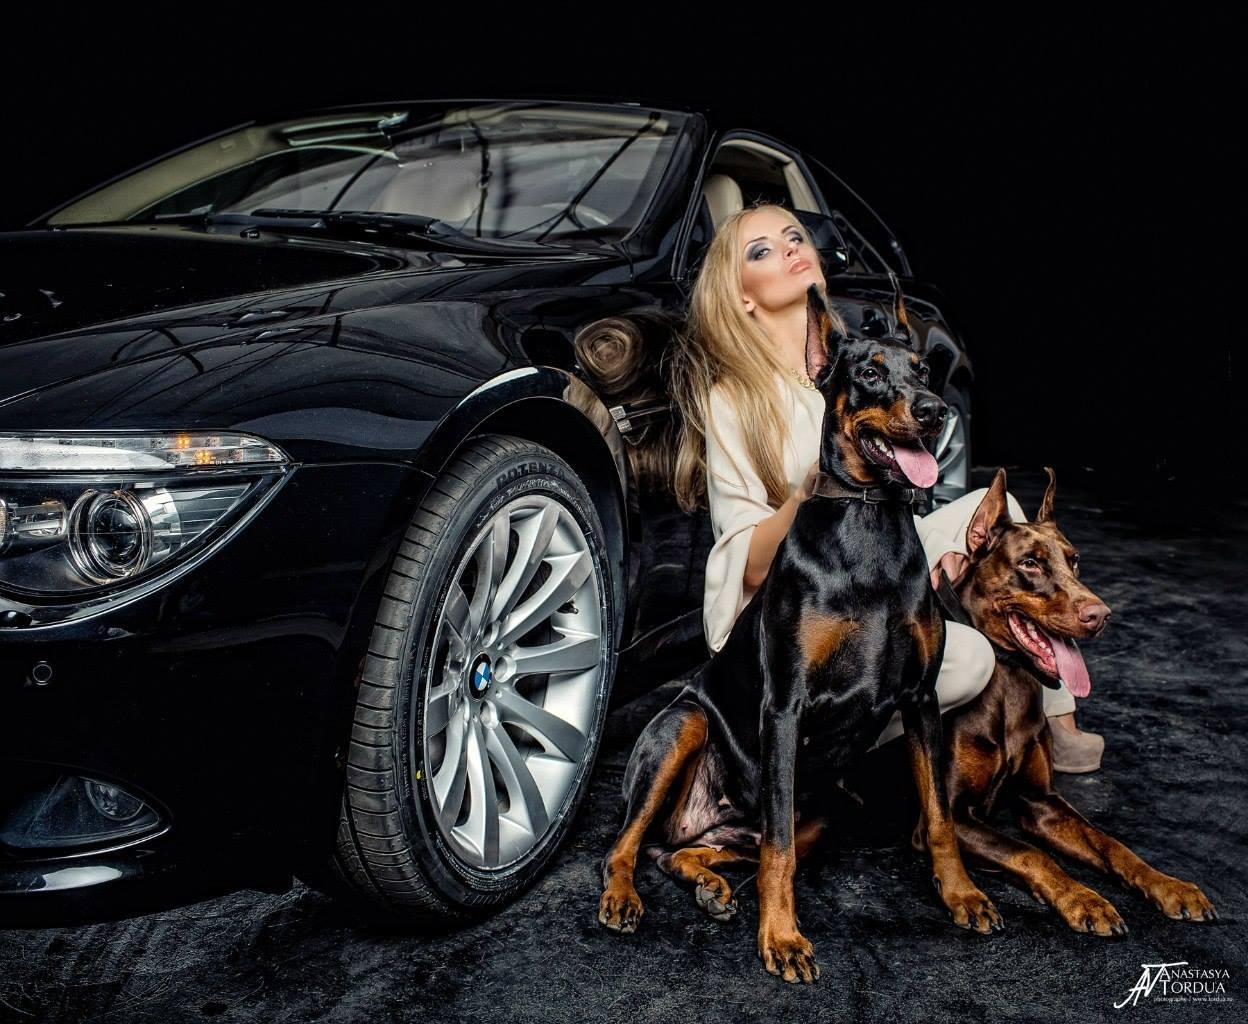 Bmw M5 Girl Wallpaper Model Anna Trisvetova Makes Old Bmw 6 Series Look Gangsta